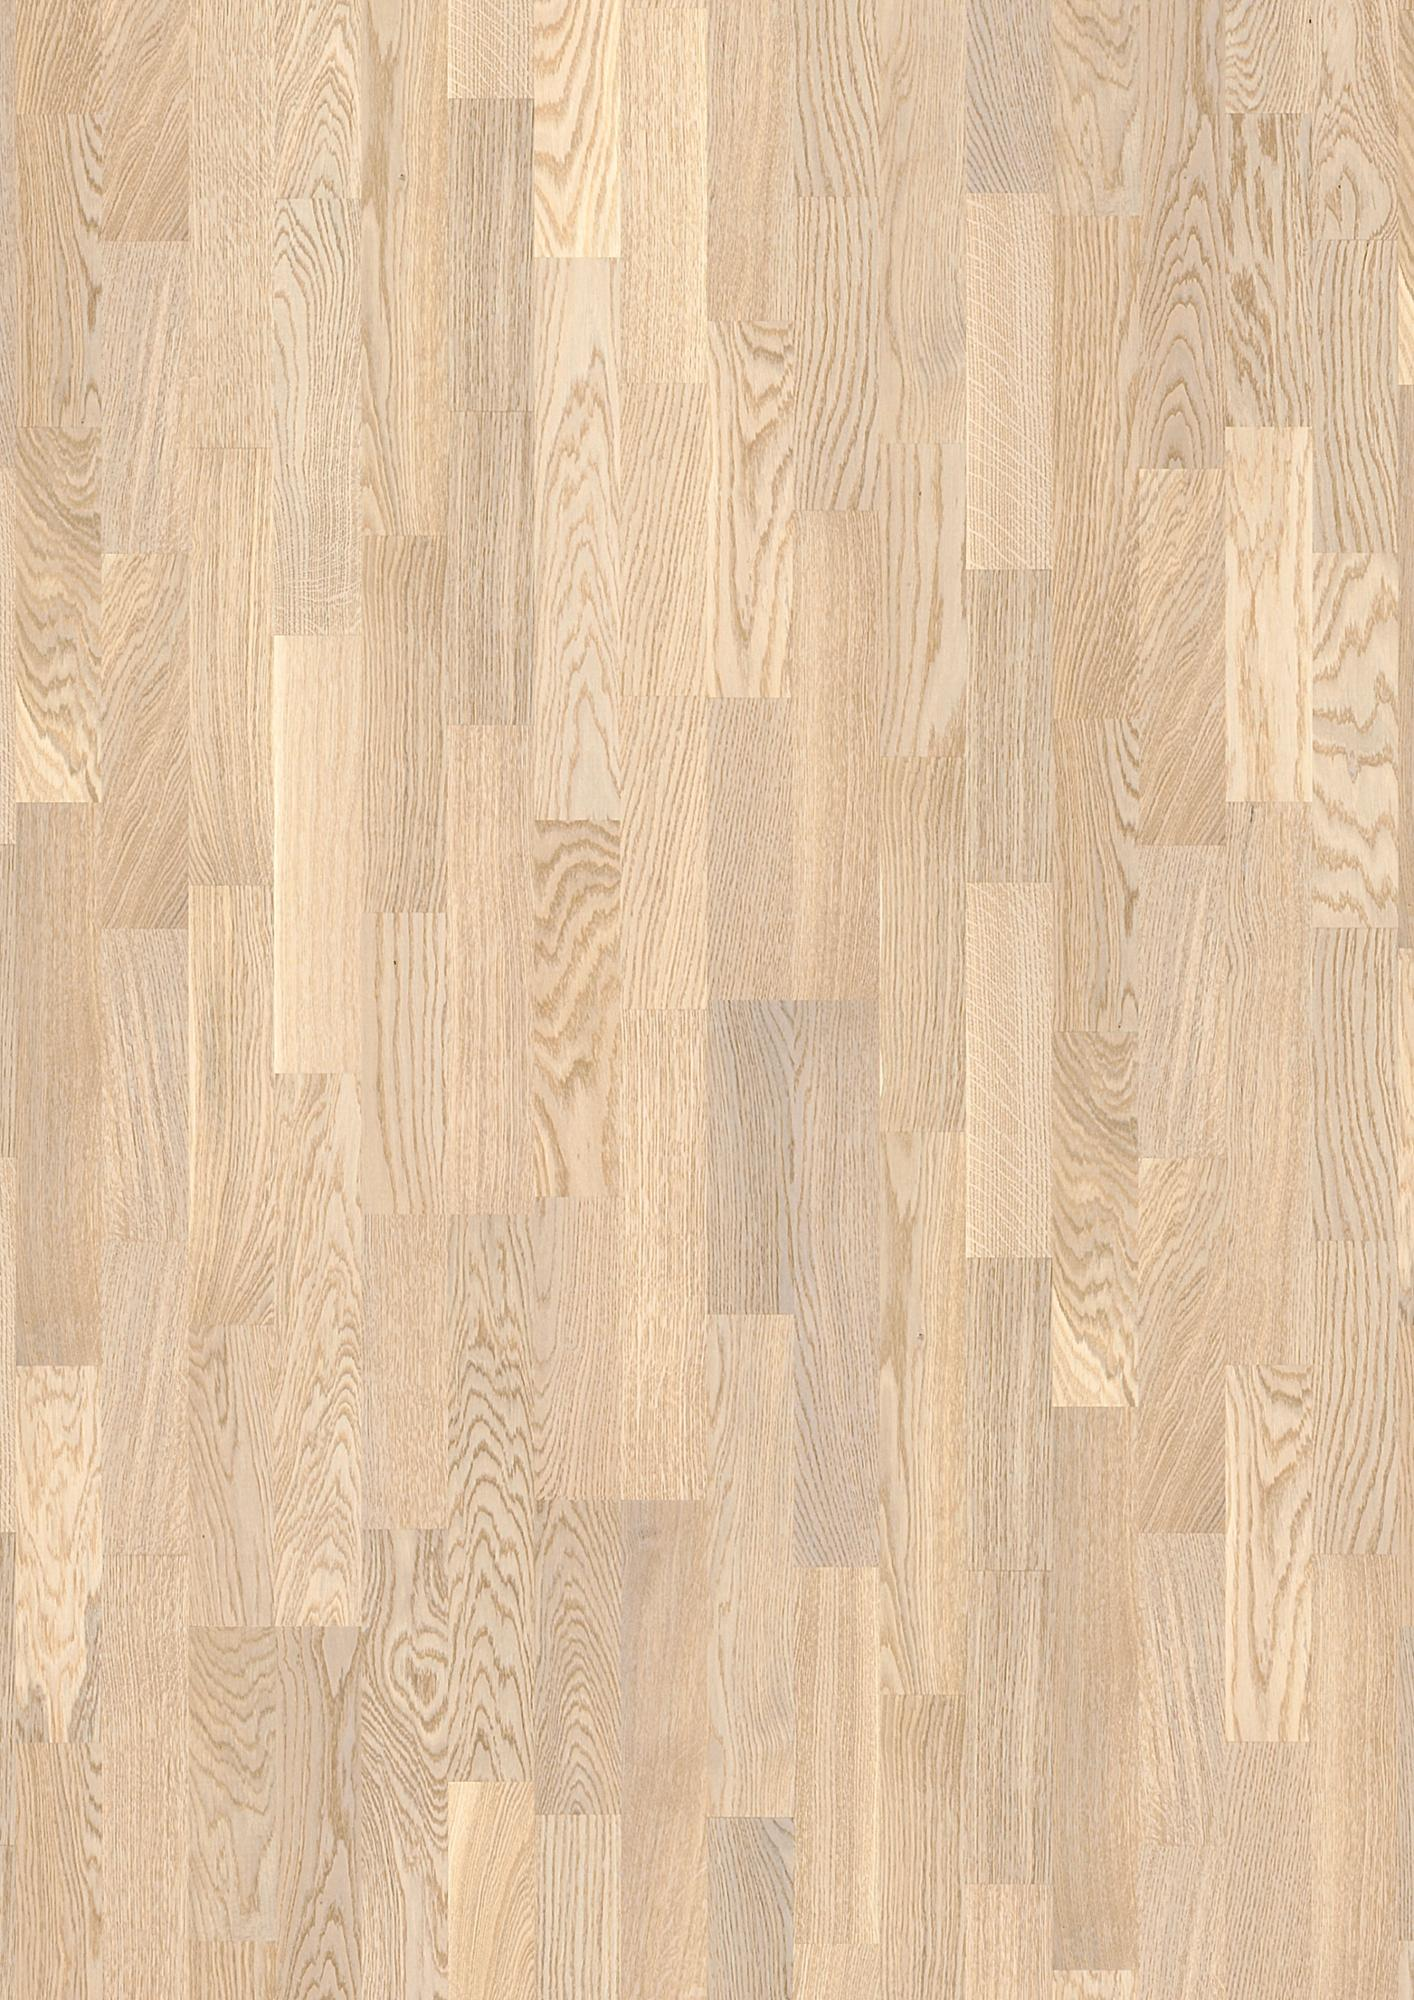 Oak Concerto White Live Matt Lacquer White Unbrushed Square Edged Longstrip 3 Strip 14x215x2200mm